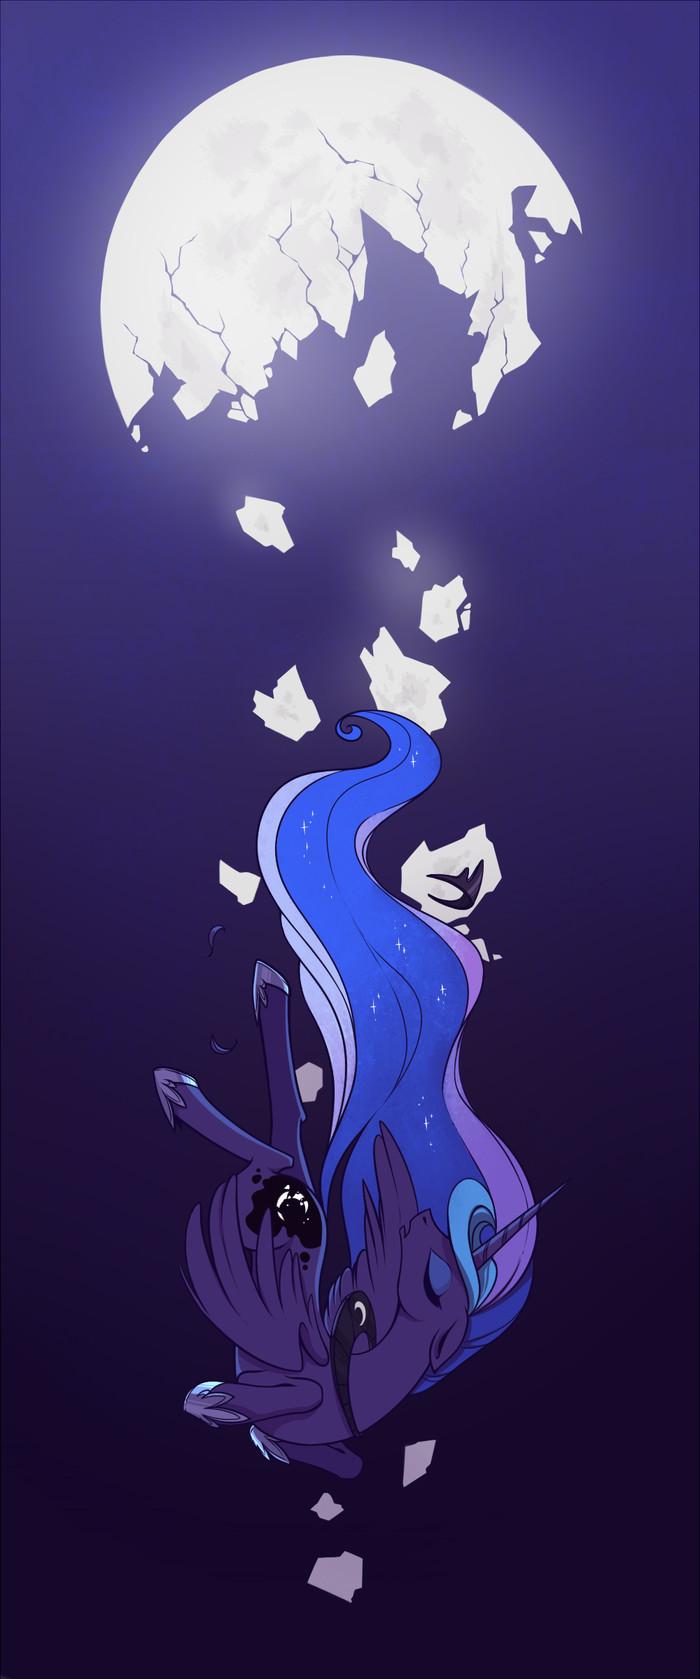 Broken Moon and Extinguished Sun My Little Pony, Princess Luna, Princess Celestia, MLP Sad, 28GoodDays, Длиннопост